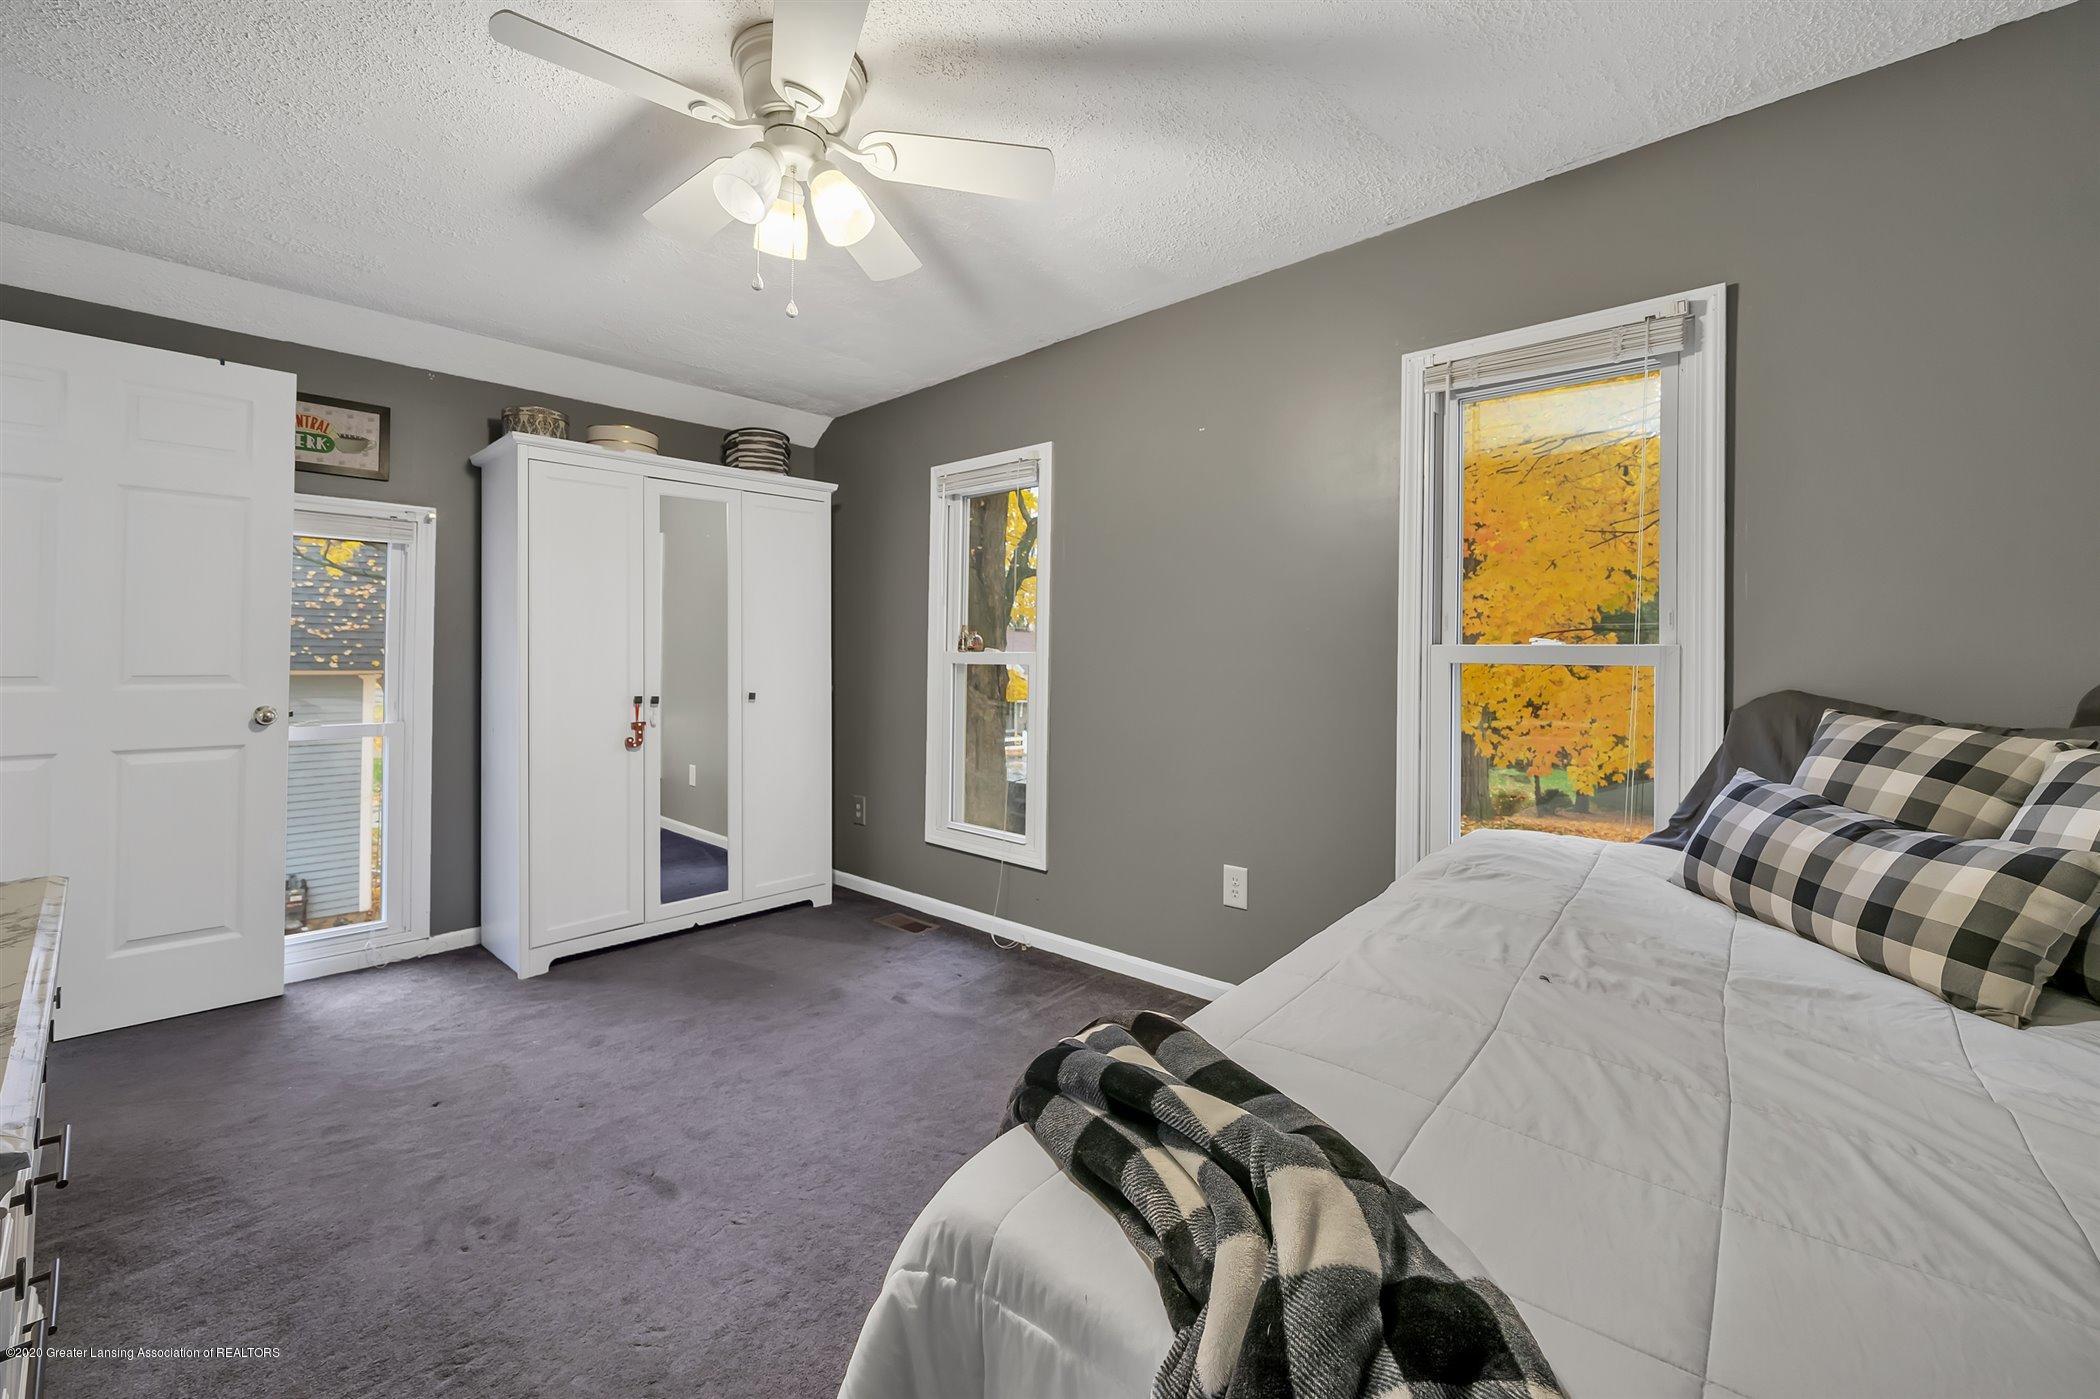 328 E 2nd St - (22) SECOND FLOOR Bedroom 3 - 23